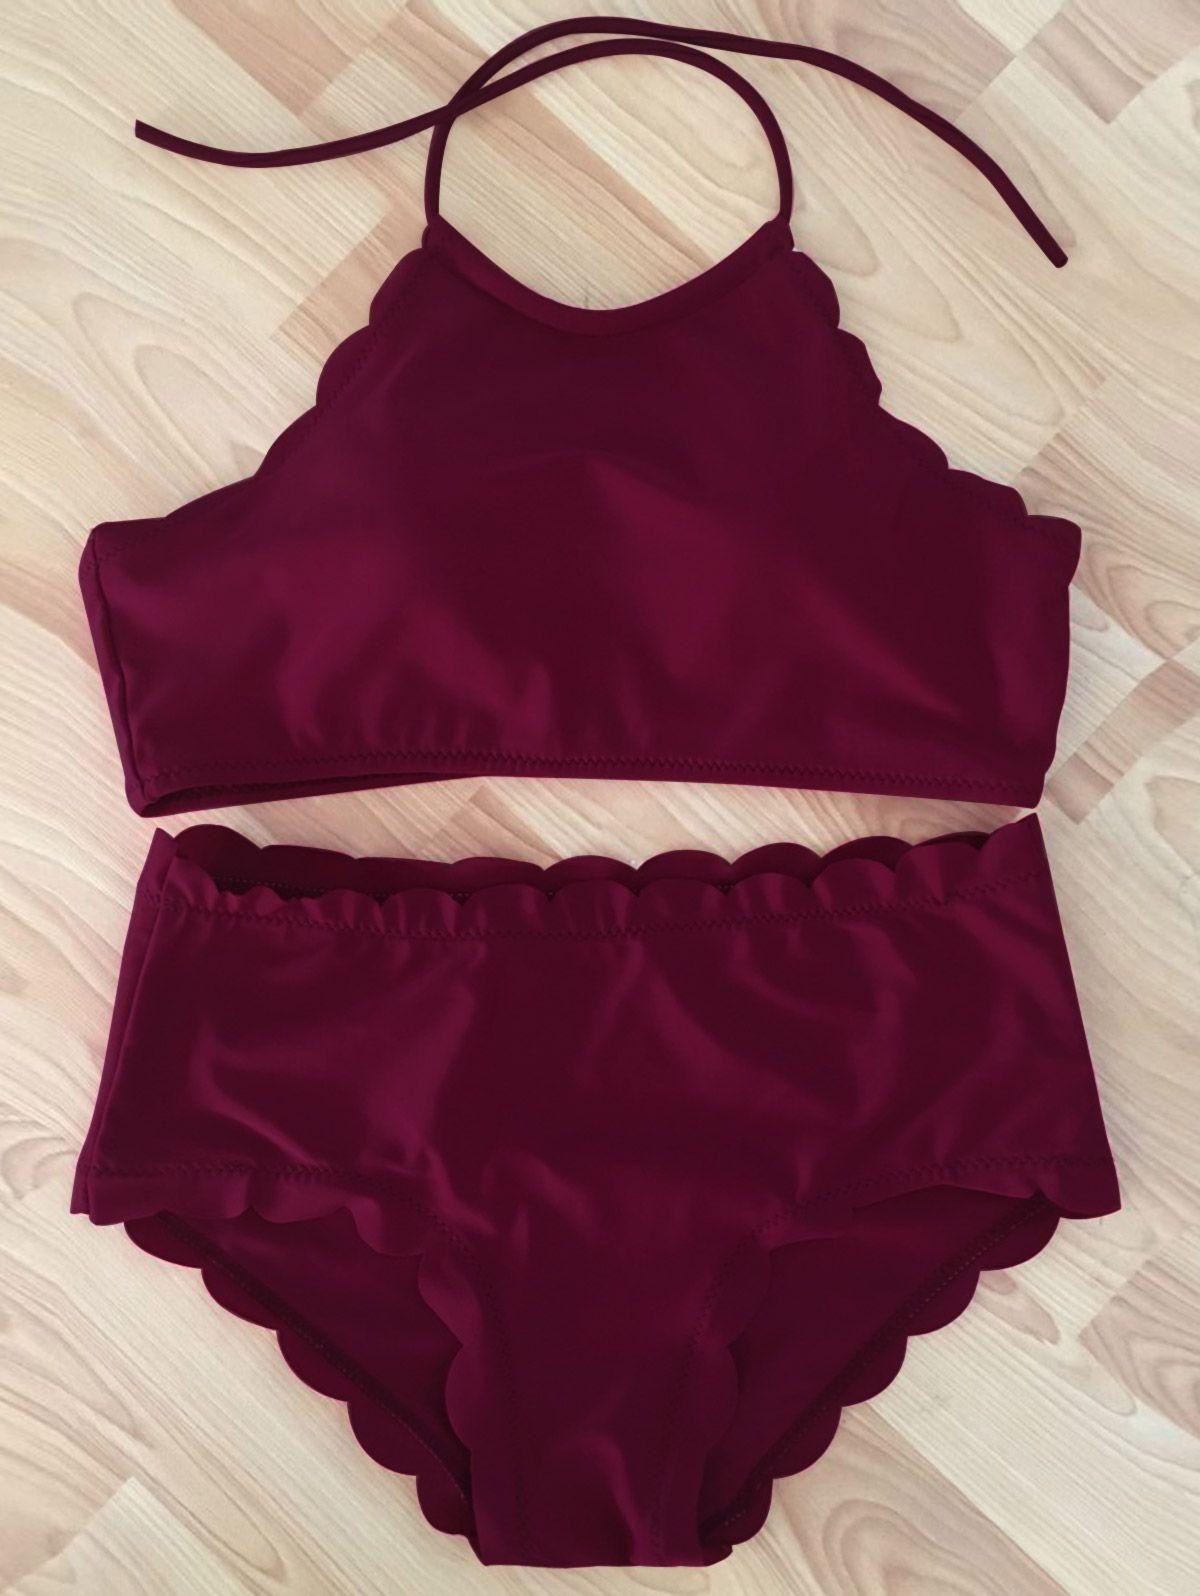 849c2eabf30ca Wine Red High-Neck Scalloped Bikini Set #Wine #Red #High_Waisted #Bikini  #Swimwear #Fashion